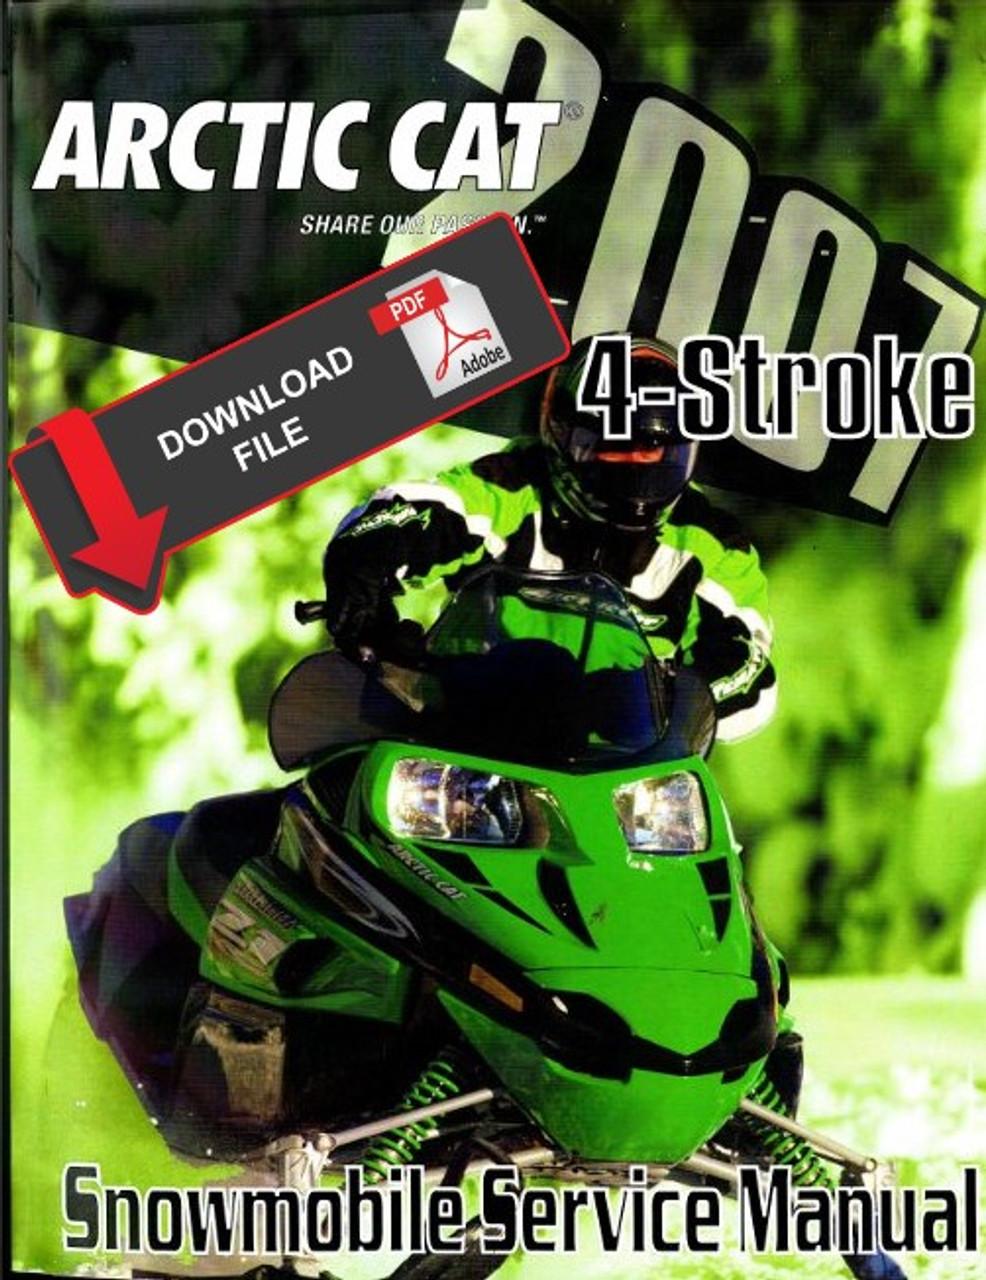 Arctic Cat 2007 T 660 Snowmobile Models Service Manual